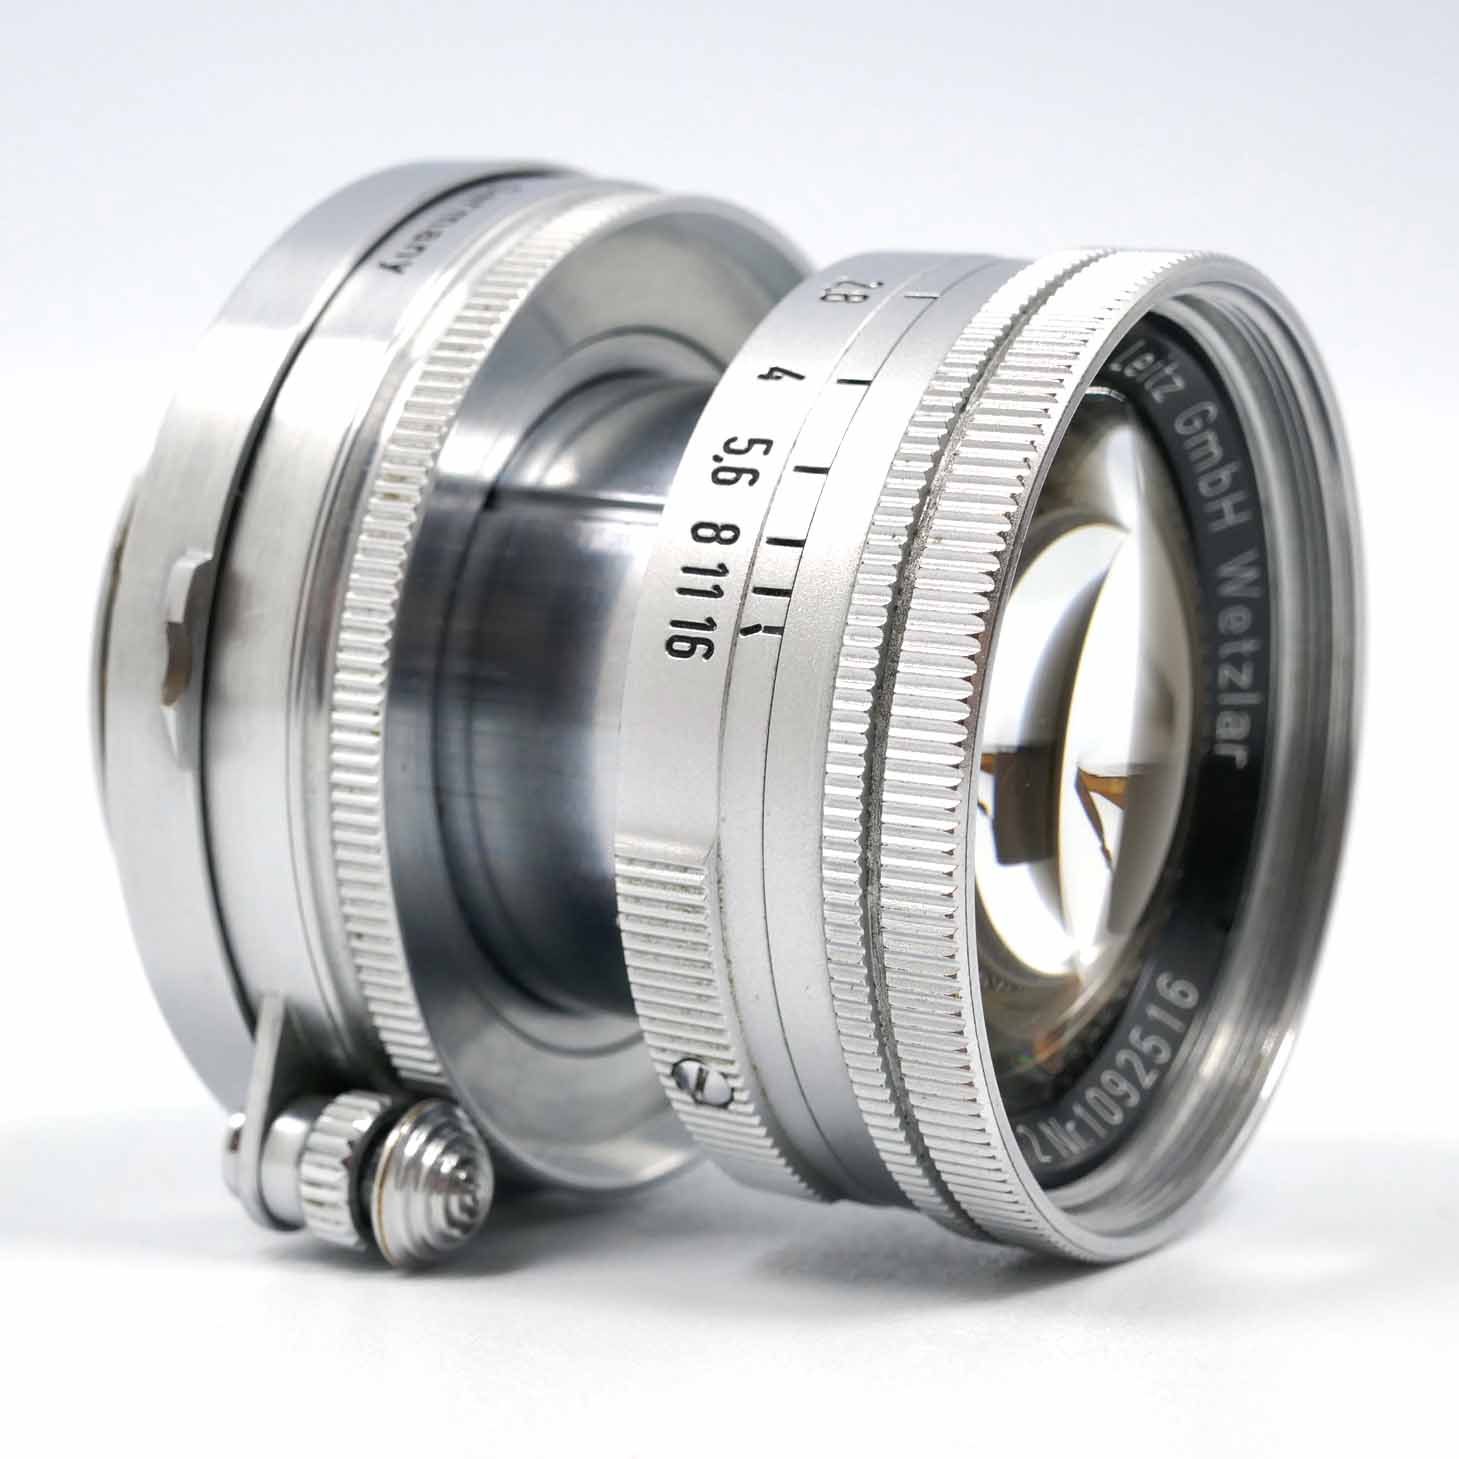 clean-cameras-Leica-IIIg+Summicron-2.0-5cm10